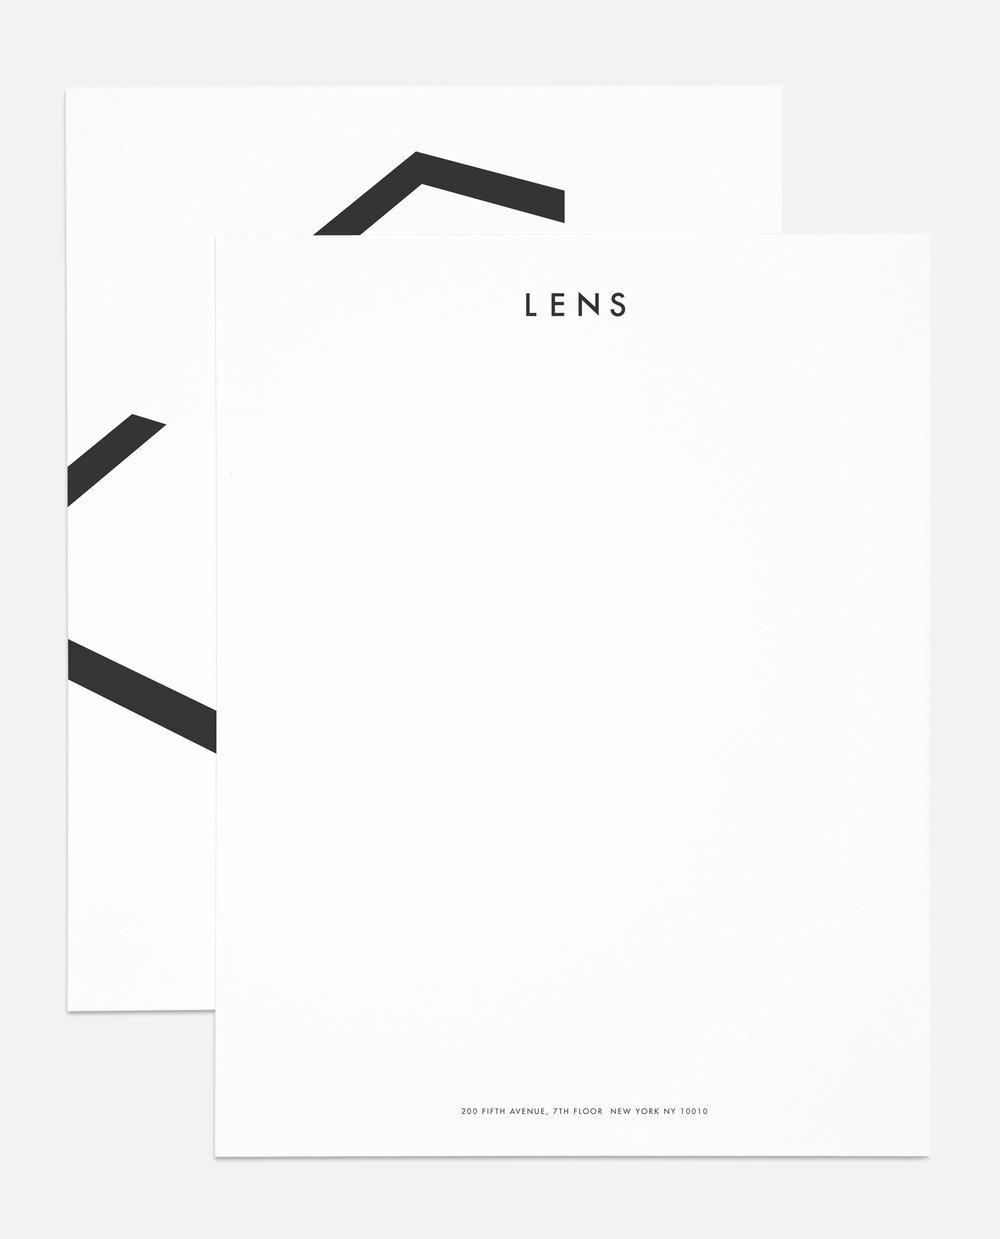 Letterhead 0424 2017-03-13.jpg